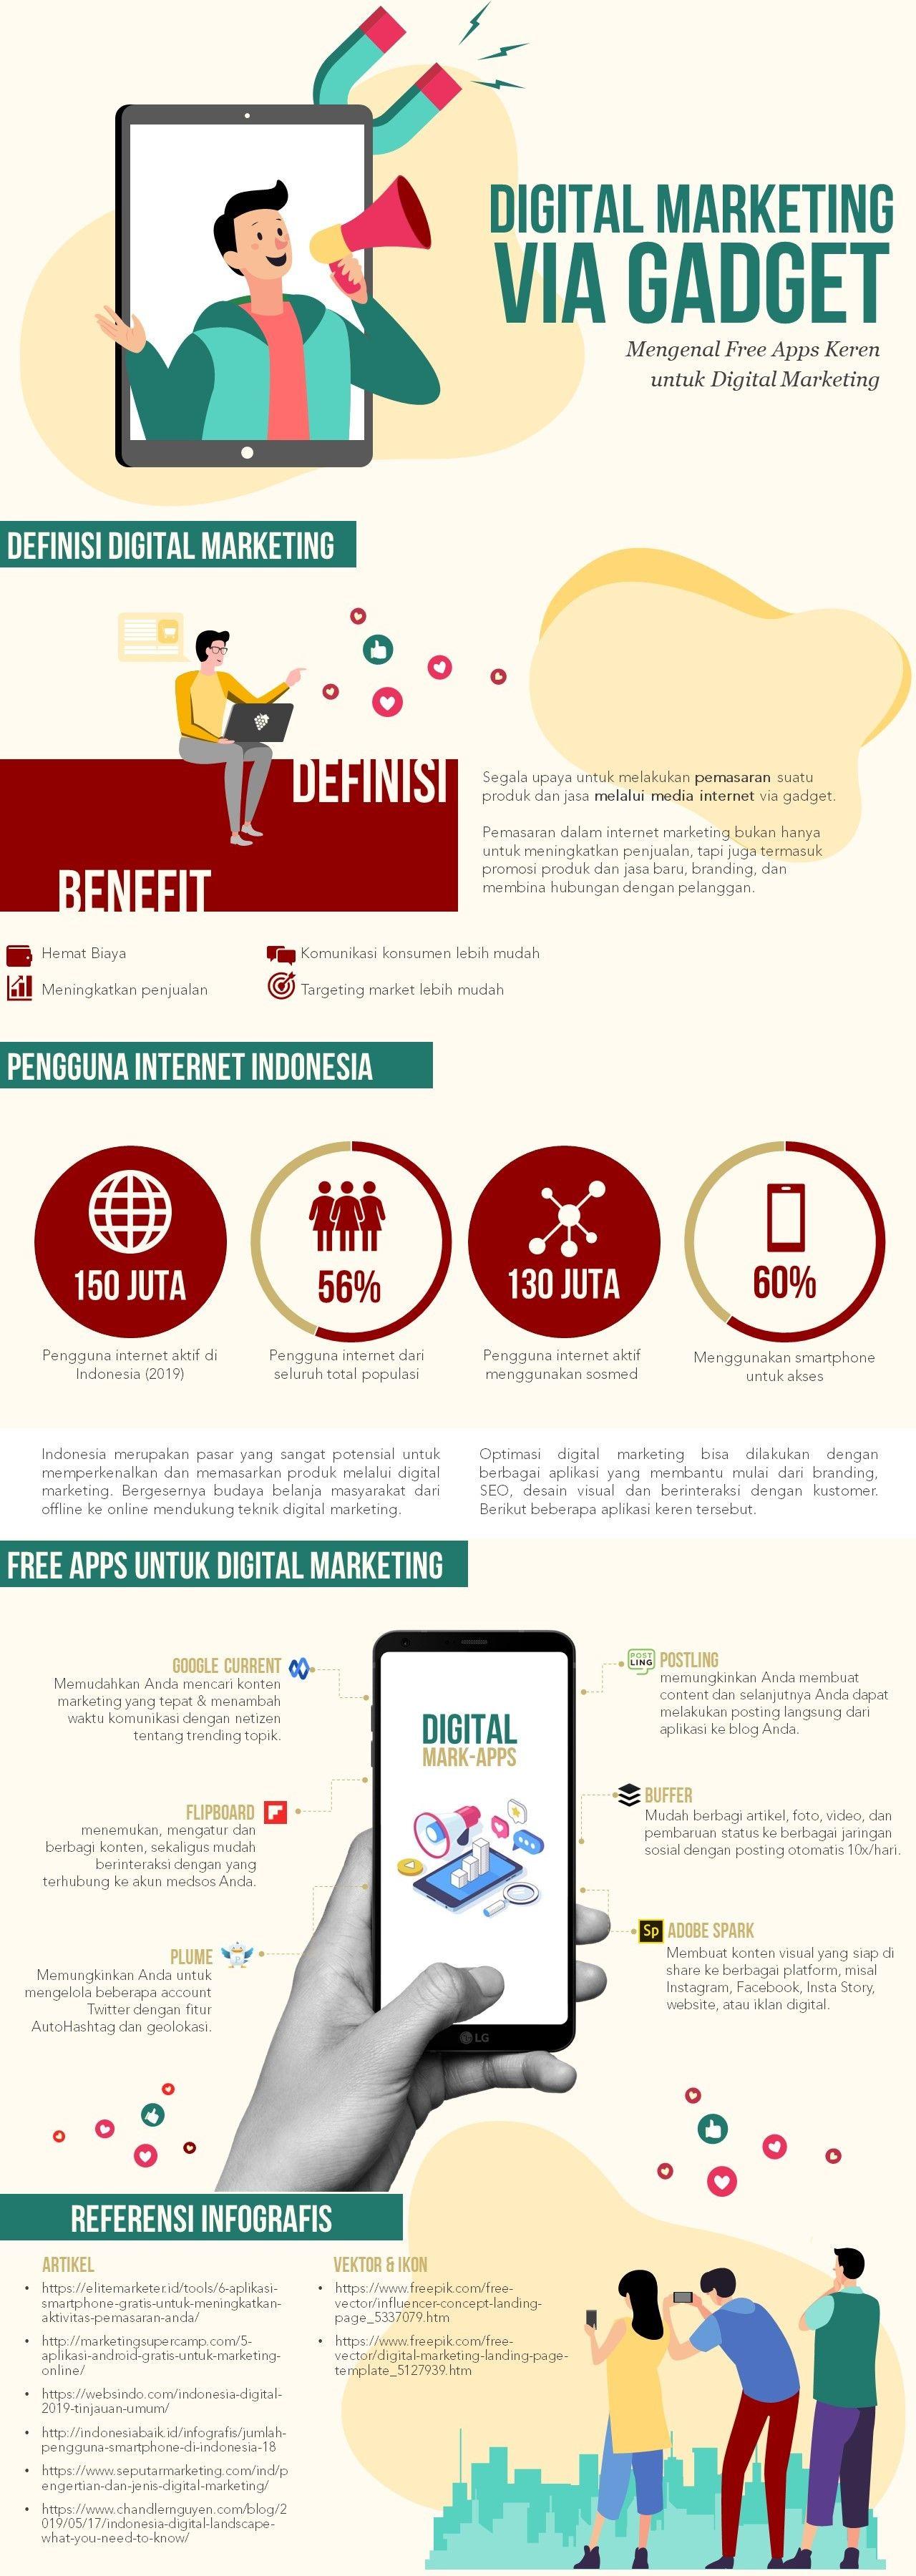 Free Apps Untuk Digital Marketing Aplikasi Marketing Pemasaran